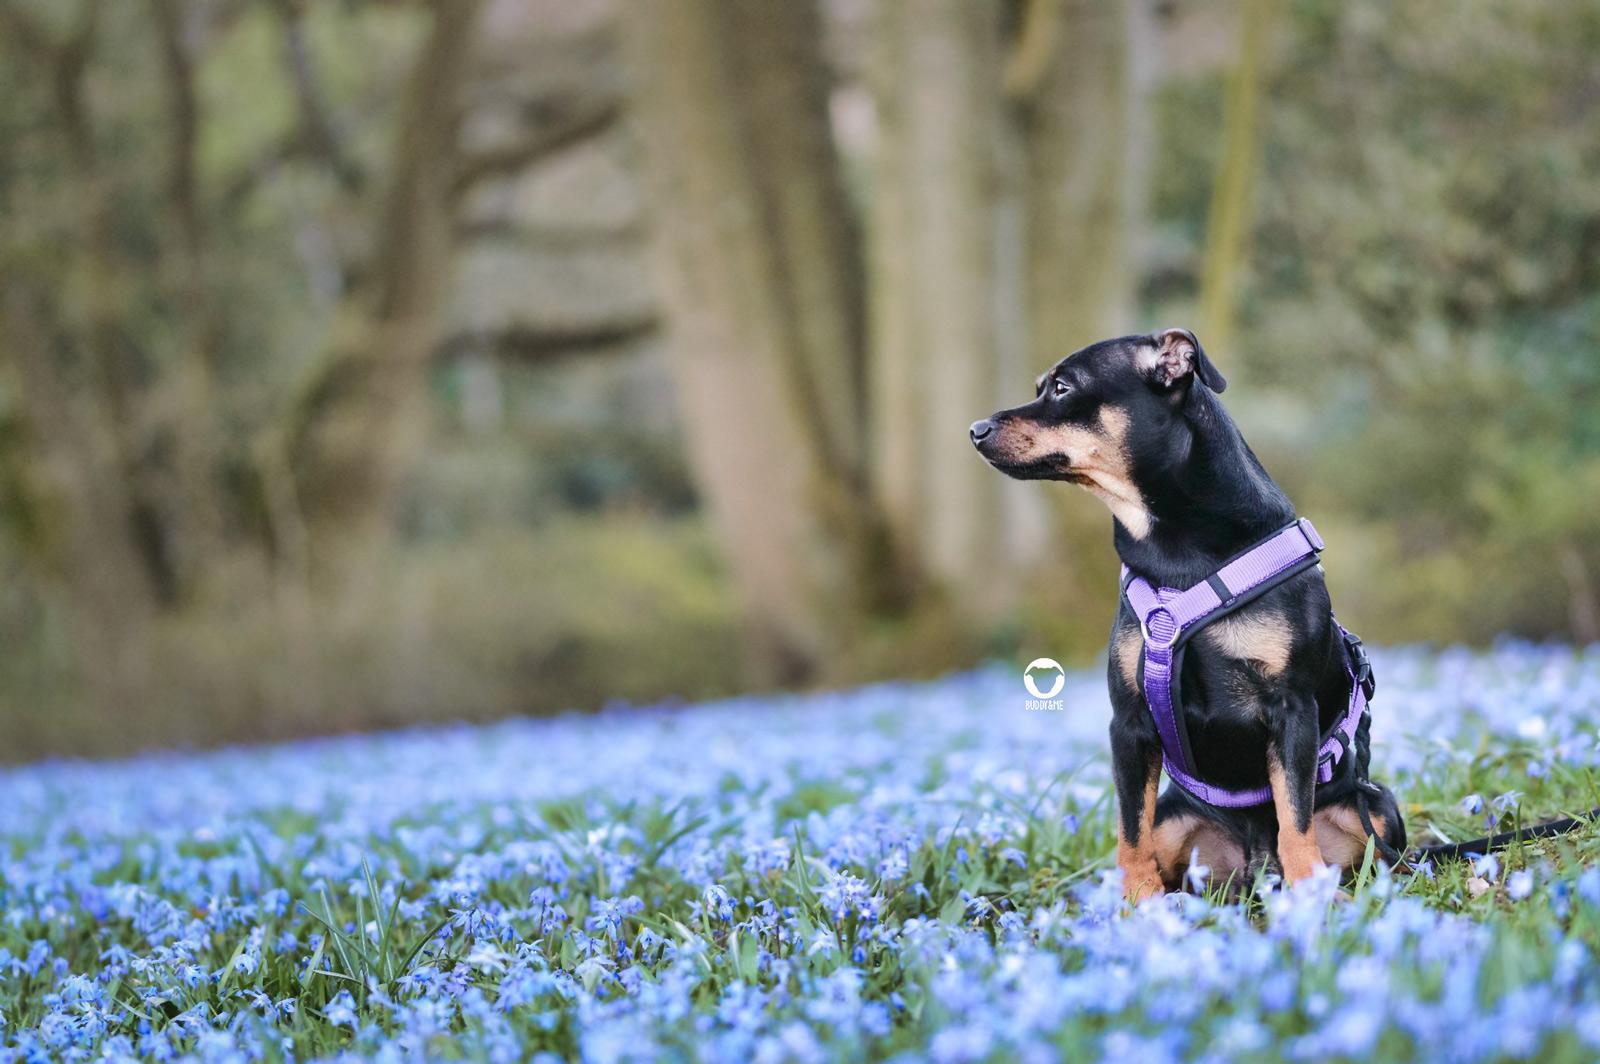 Pinscher Buddy, Buddy and Me, Hundeblog, Dogblog, Essen, Ruhrgebiet, Frühling, Blumen, Blüten, Hundefotografie, Nikon